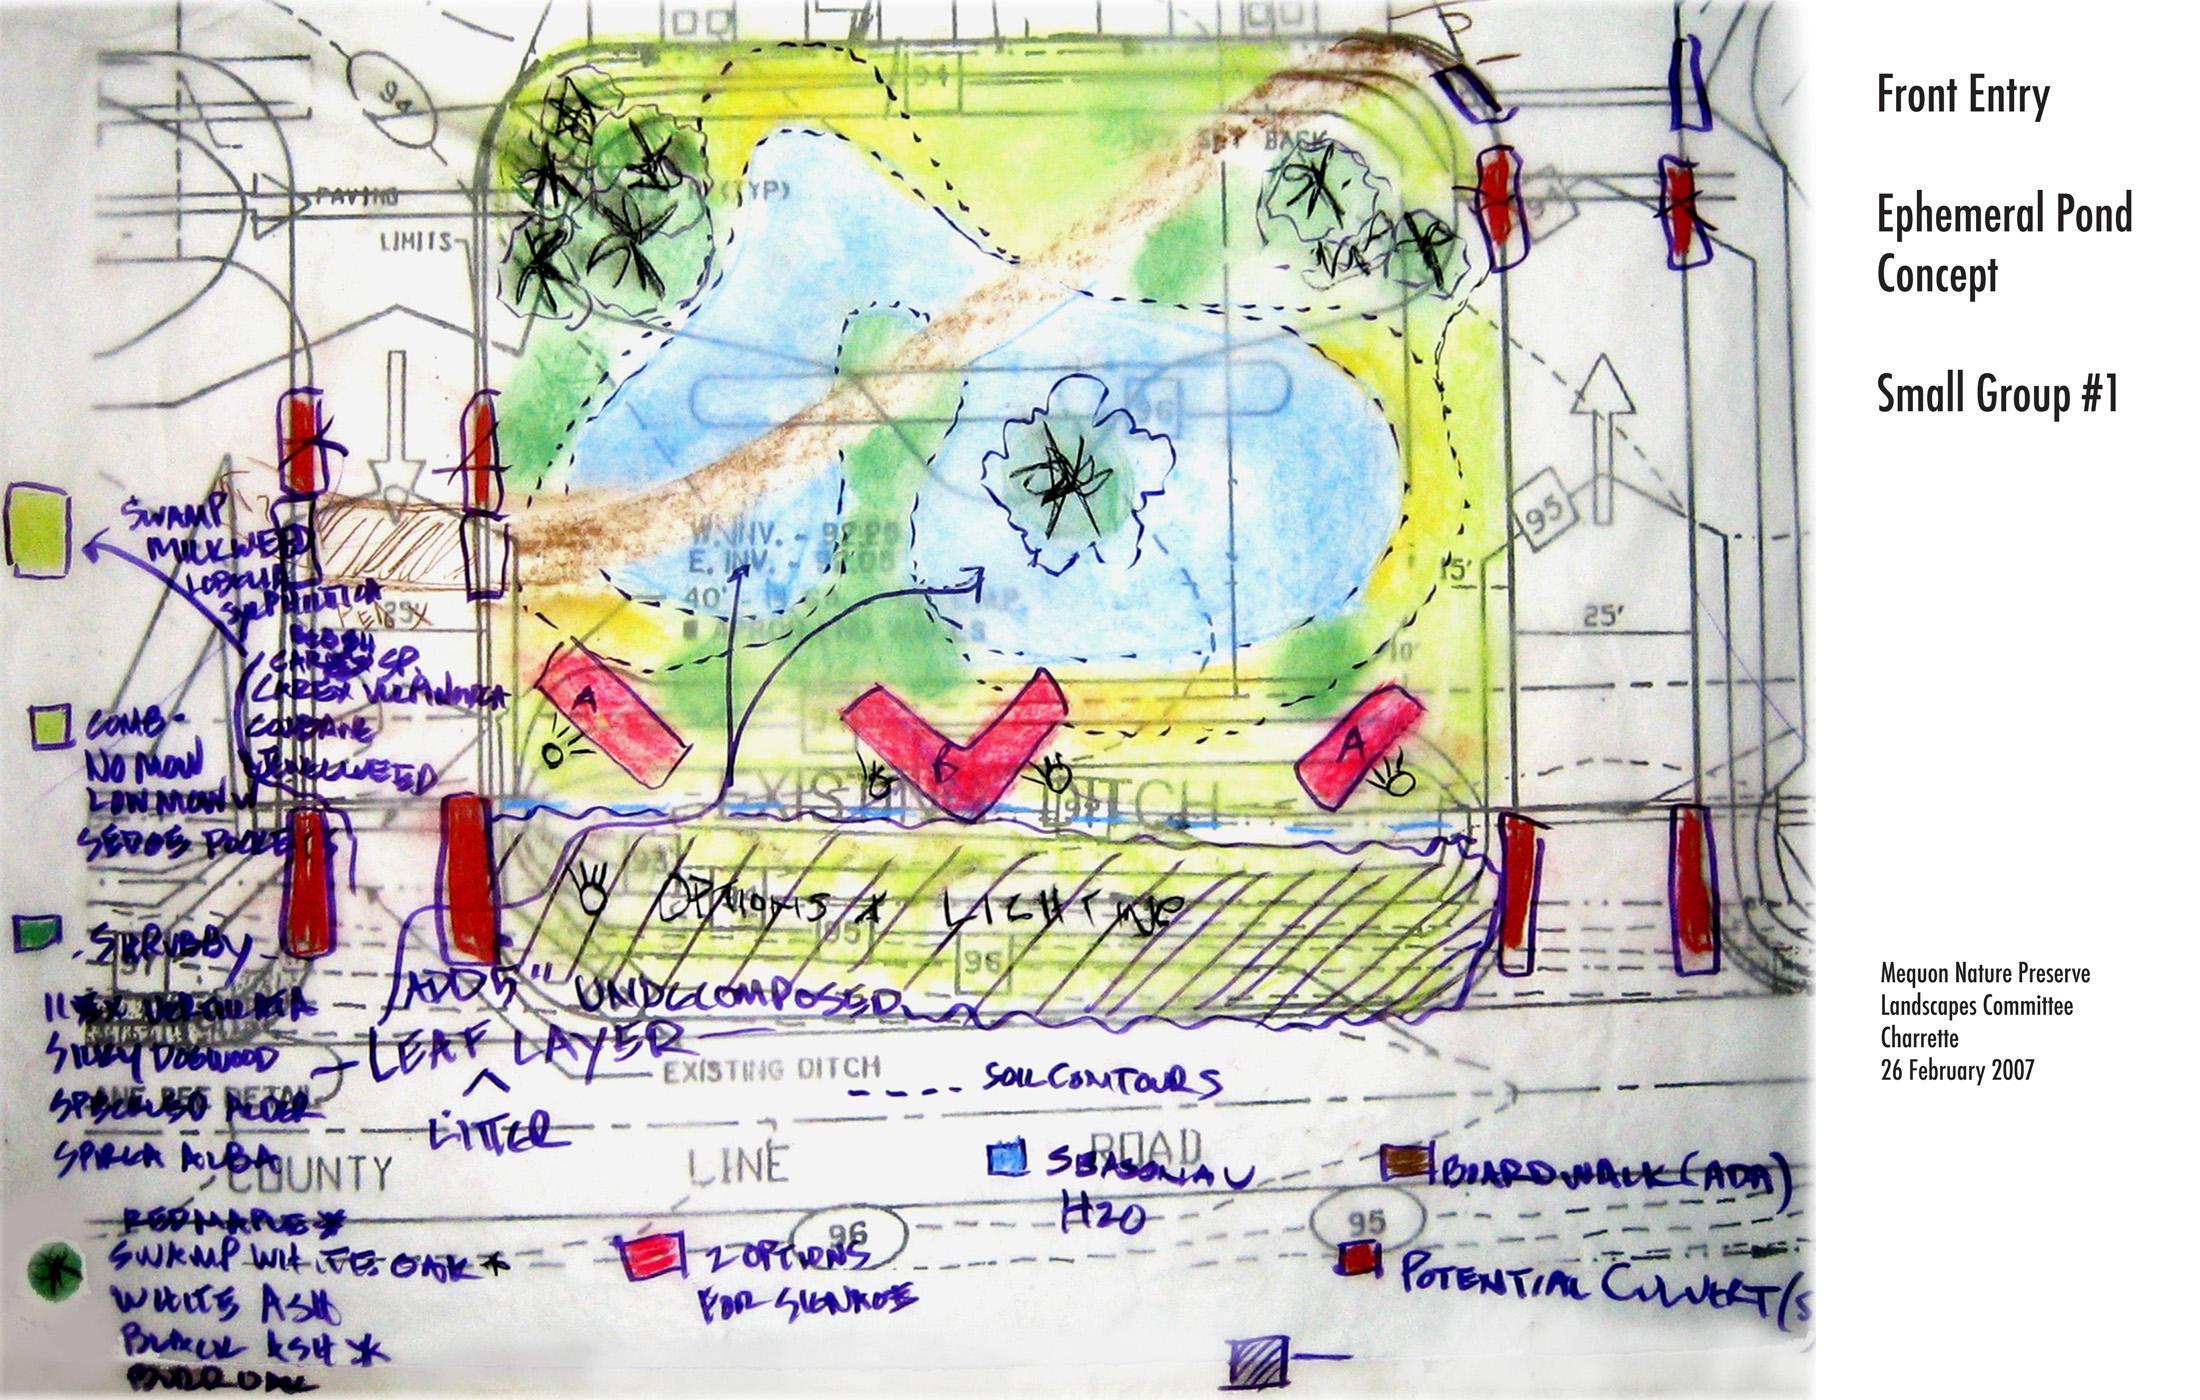 MNP-layout2-3-LoP-aten.jpg